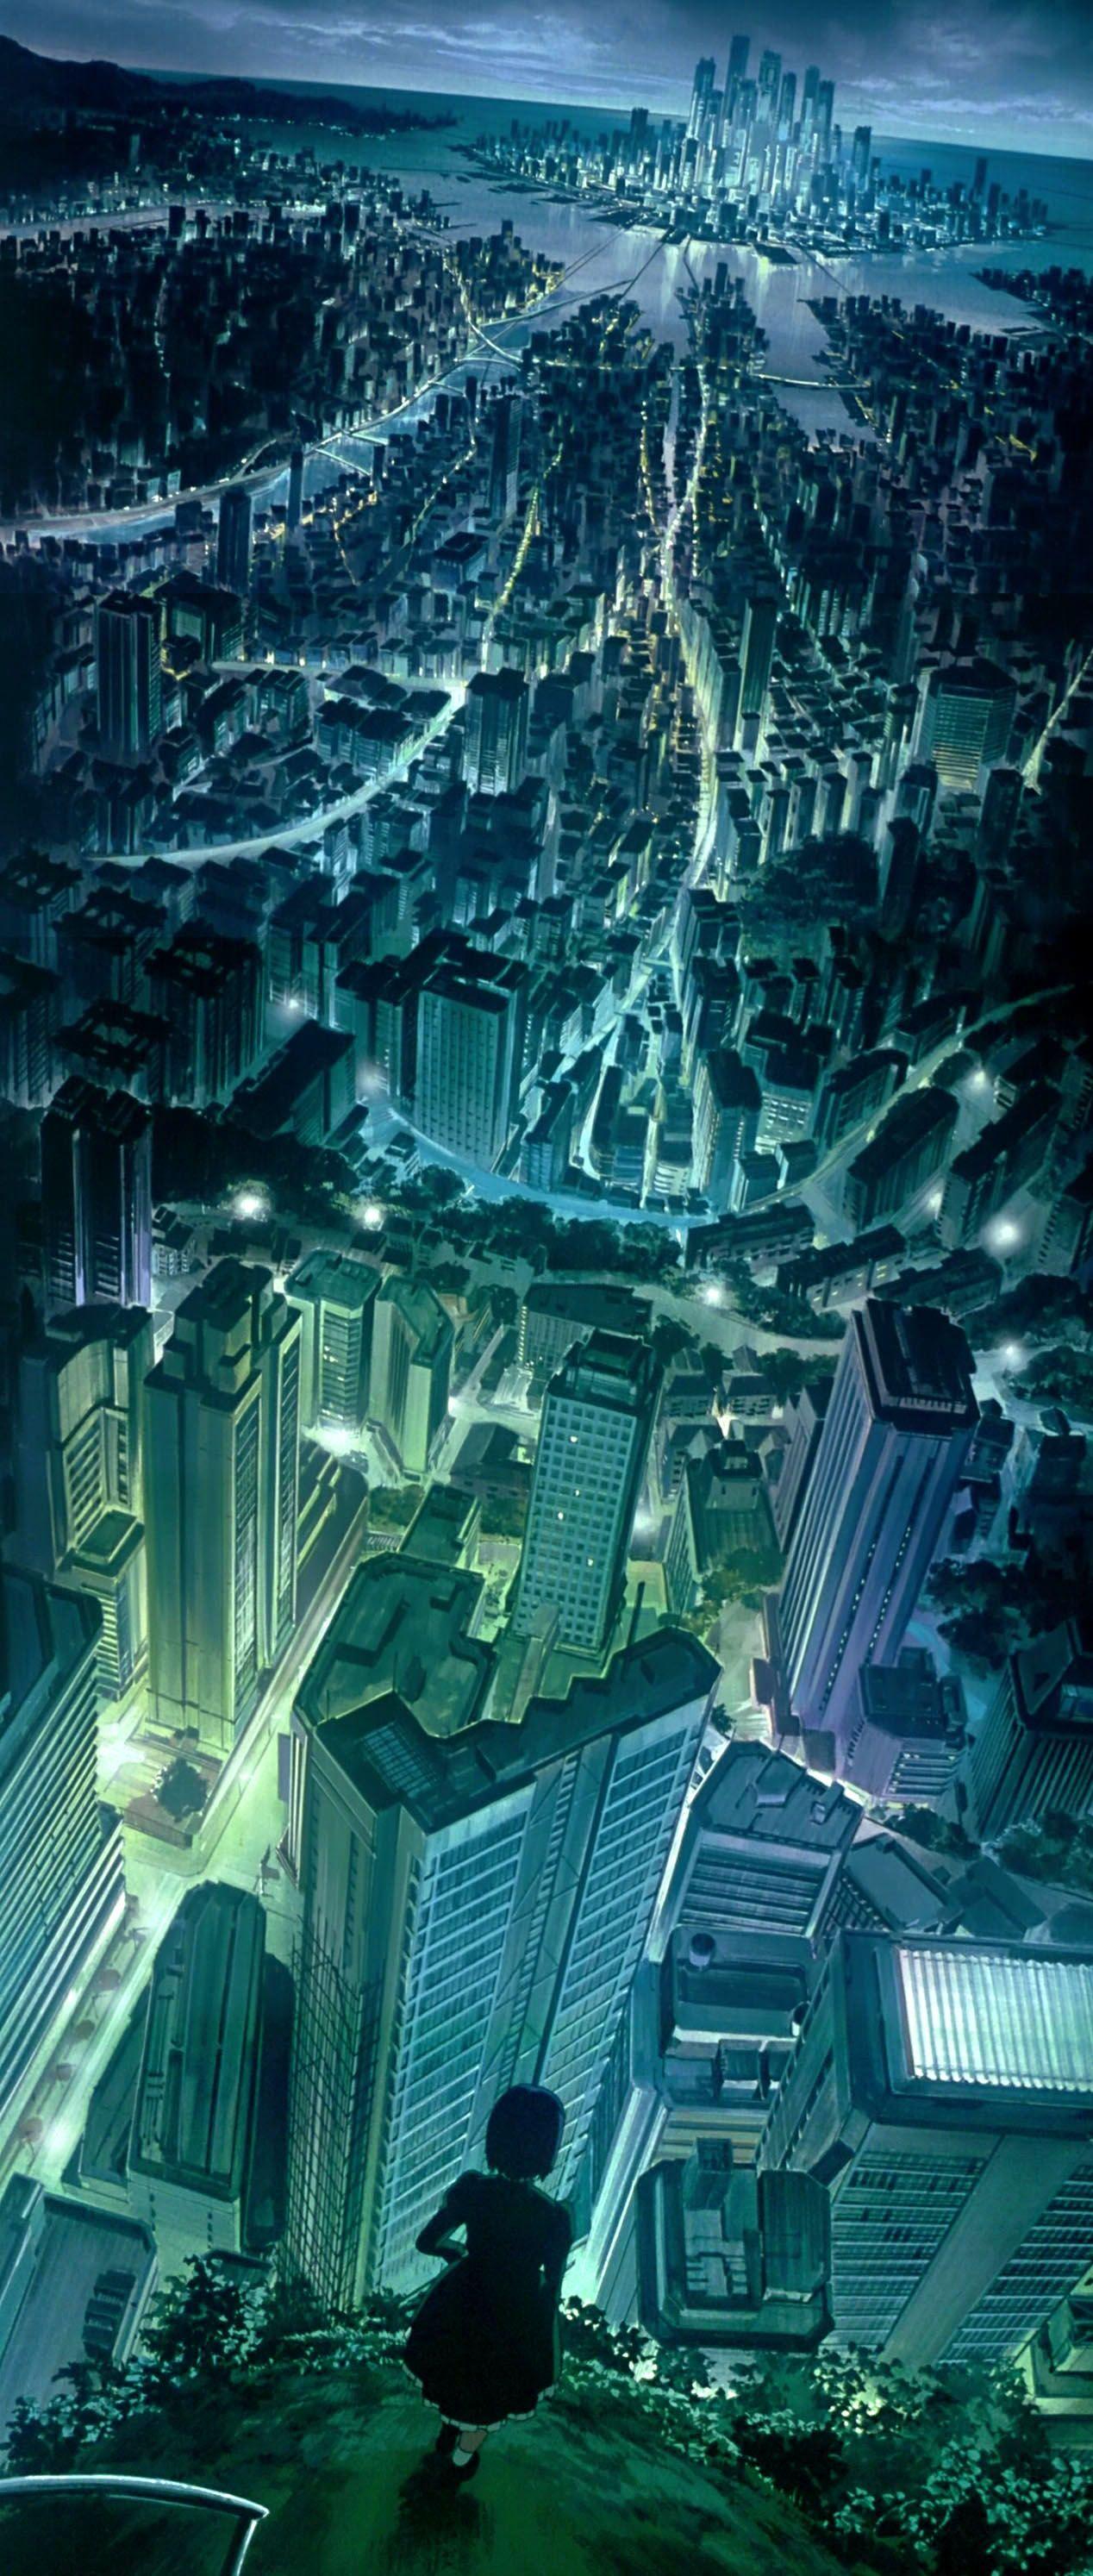 looking over all #anime #illustration | anime 배경 | pinterest